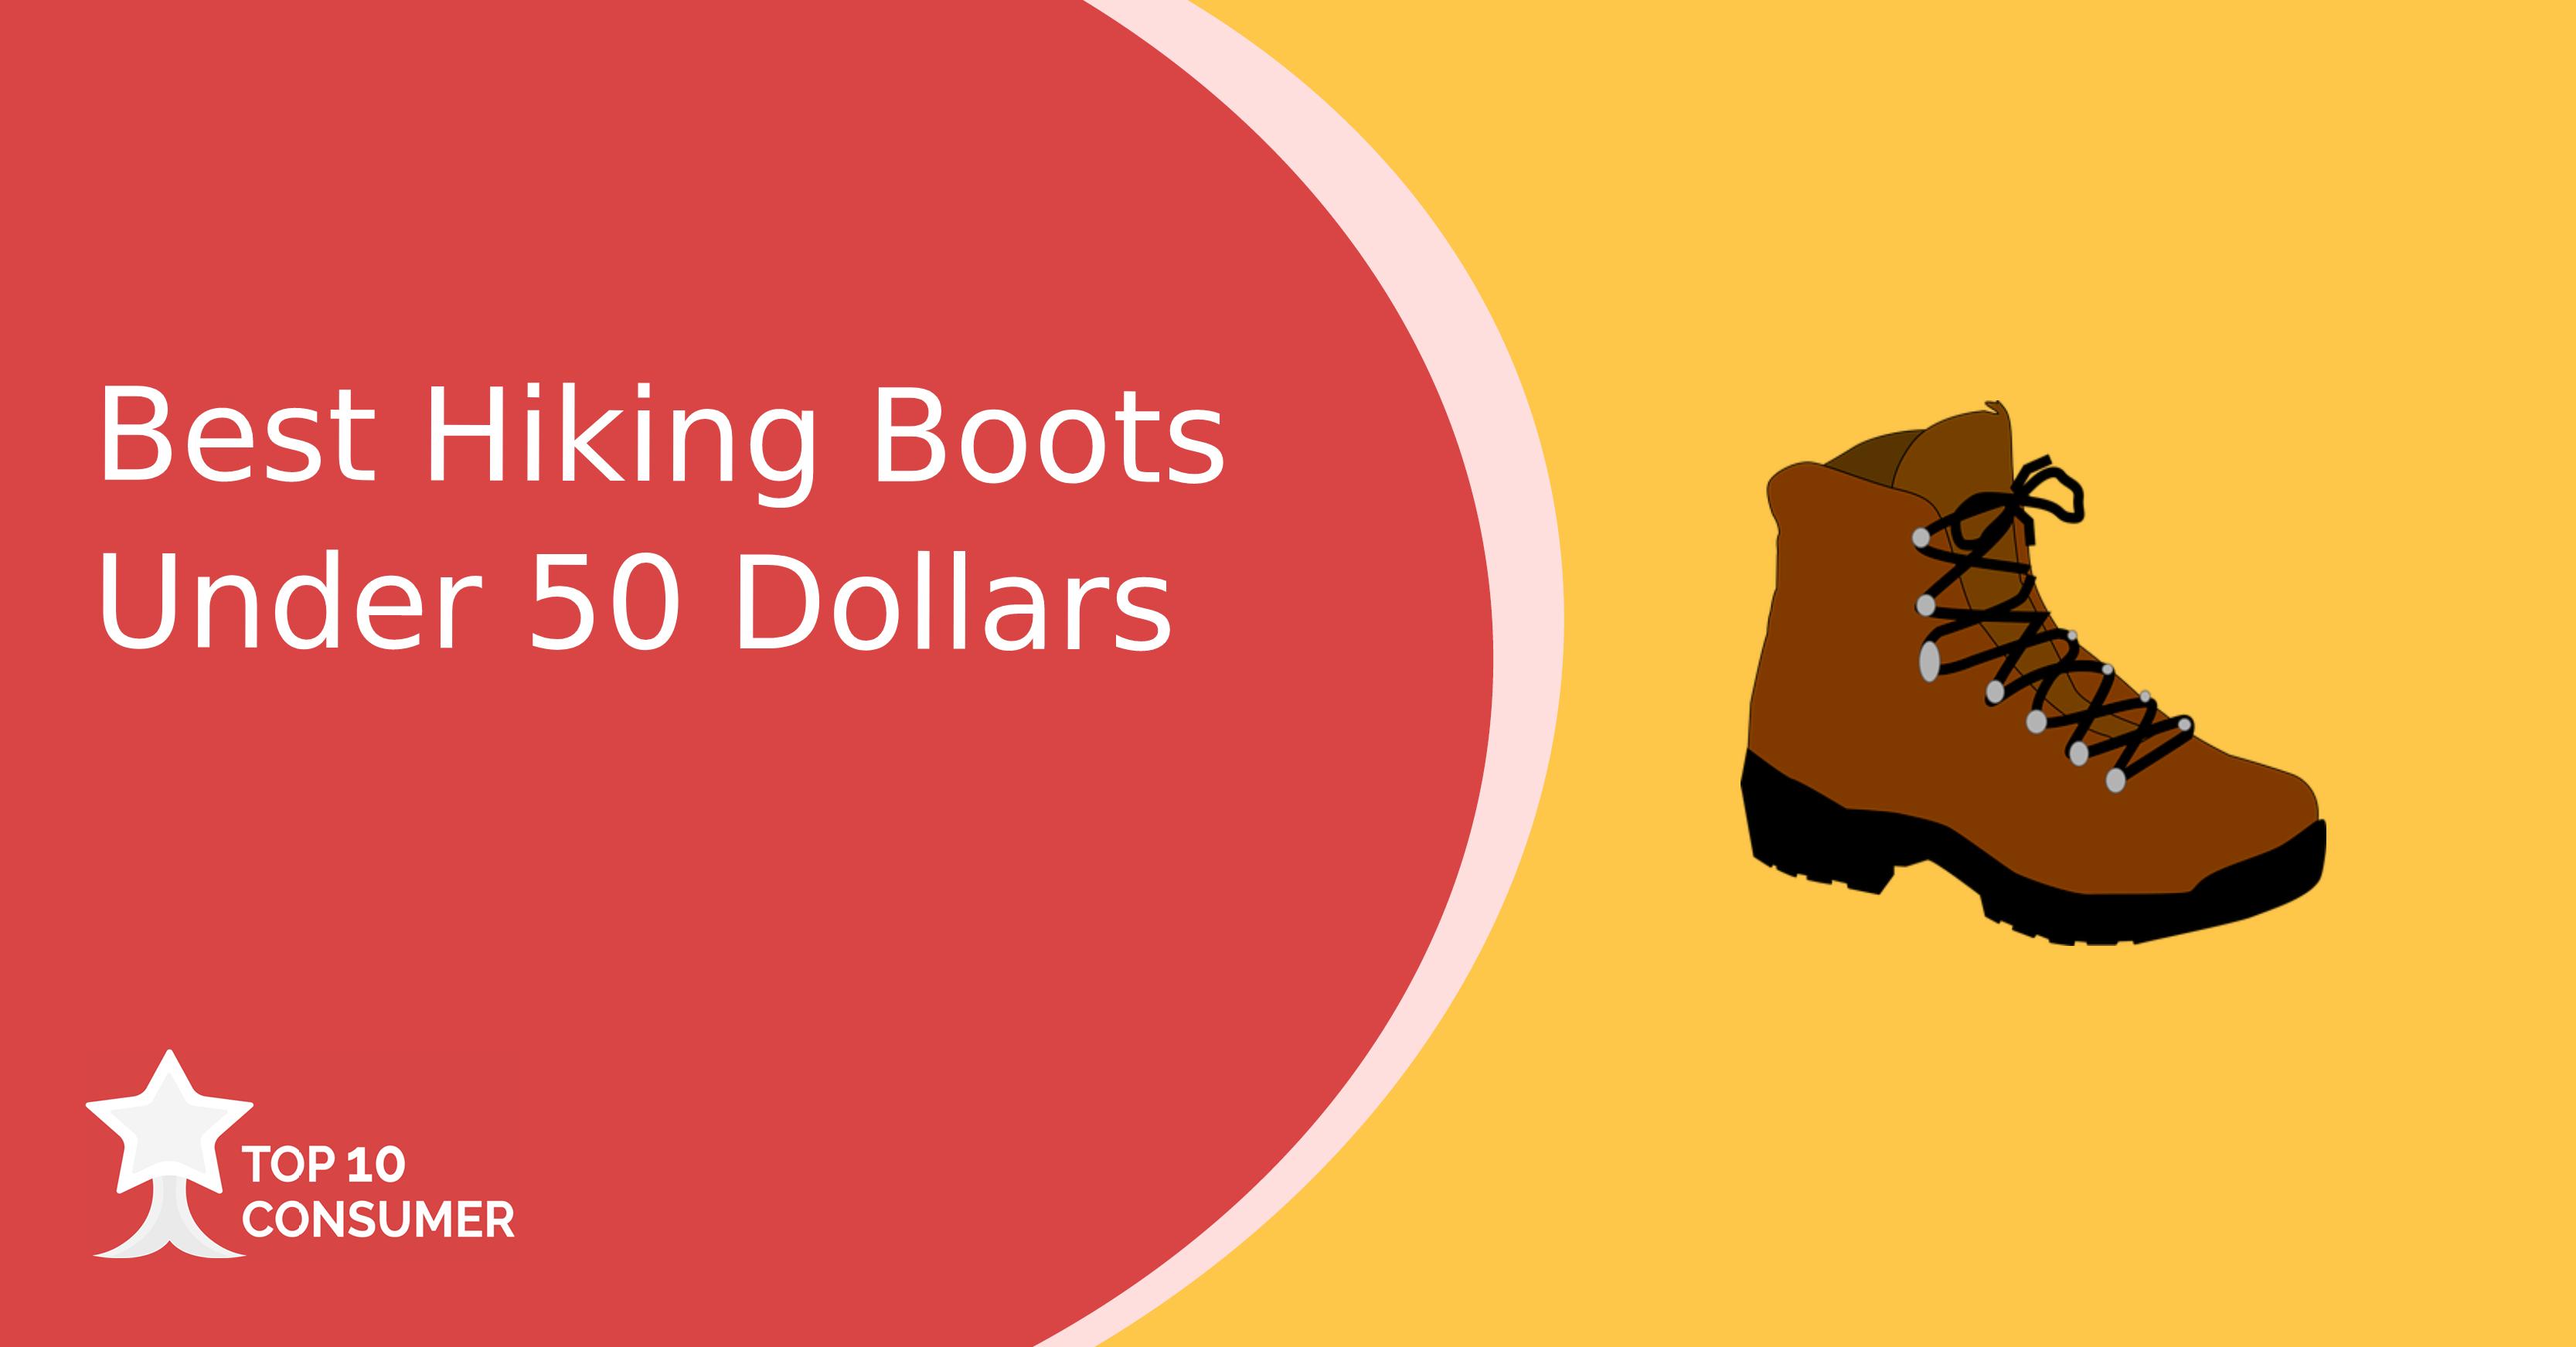 Best Hiking Boots Under 50 Dollars